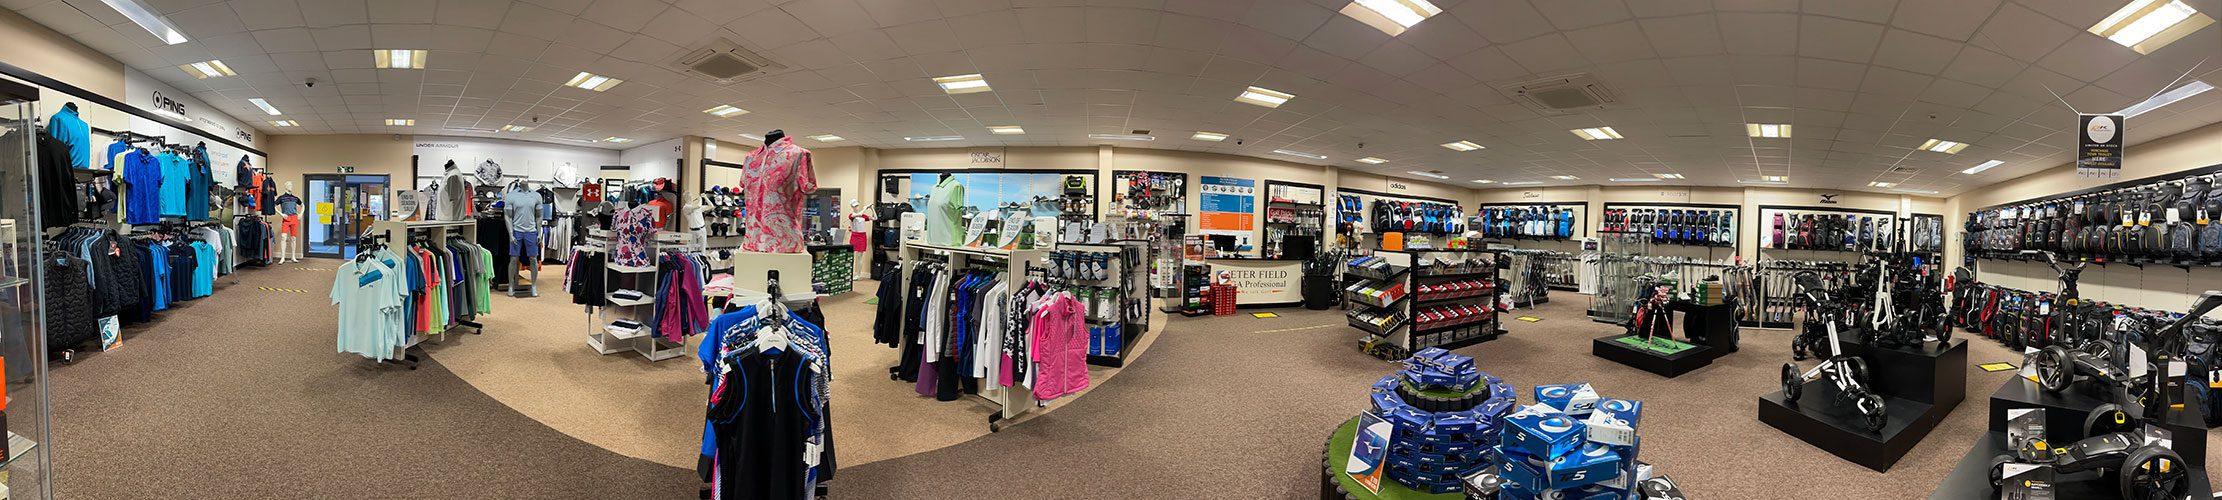 Shop   Peter Field Golf Shop, norwich